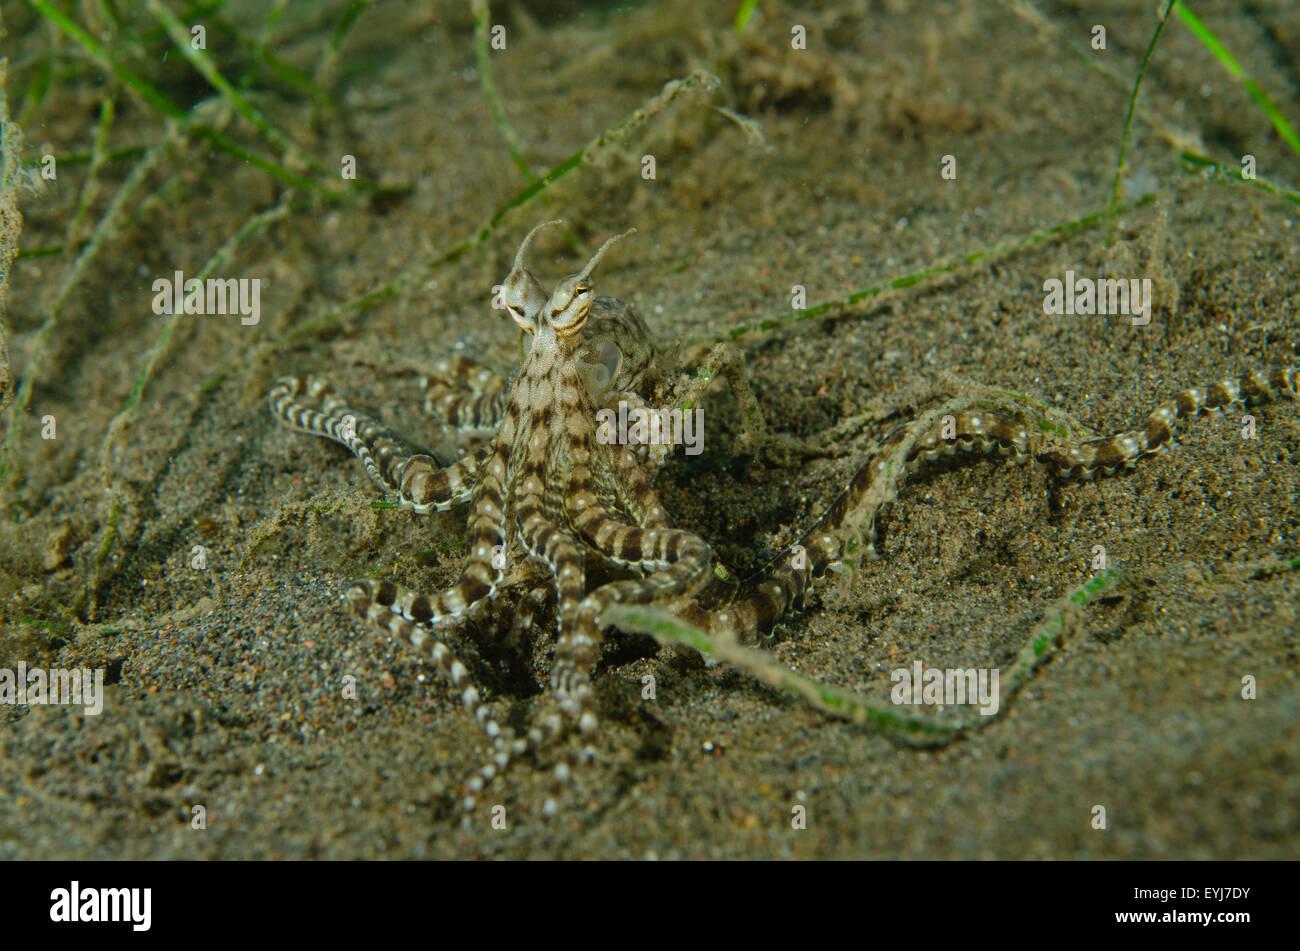 A mimic octopus, Thaumoctopus mimicus, crawls along the bottom at Puri Jati dive site, PJs, Seririt, Bali, Indonesia, - Stock Image